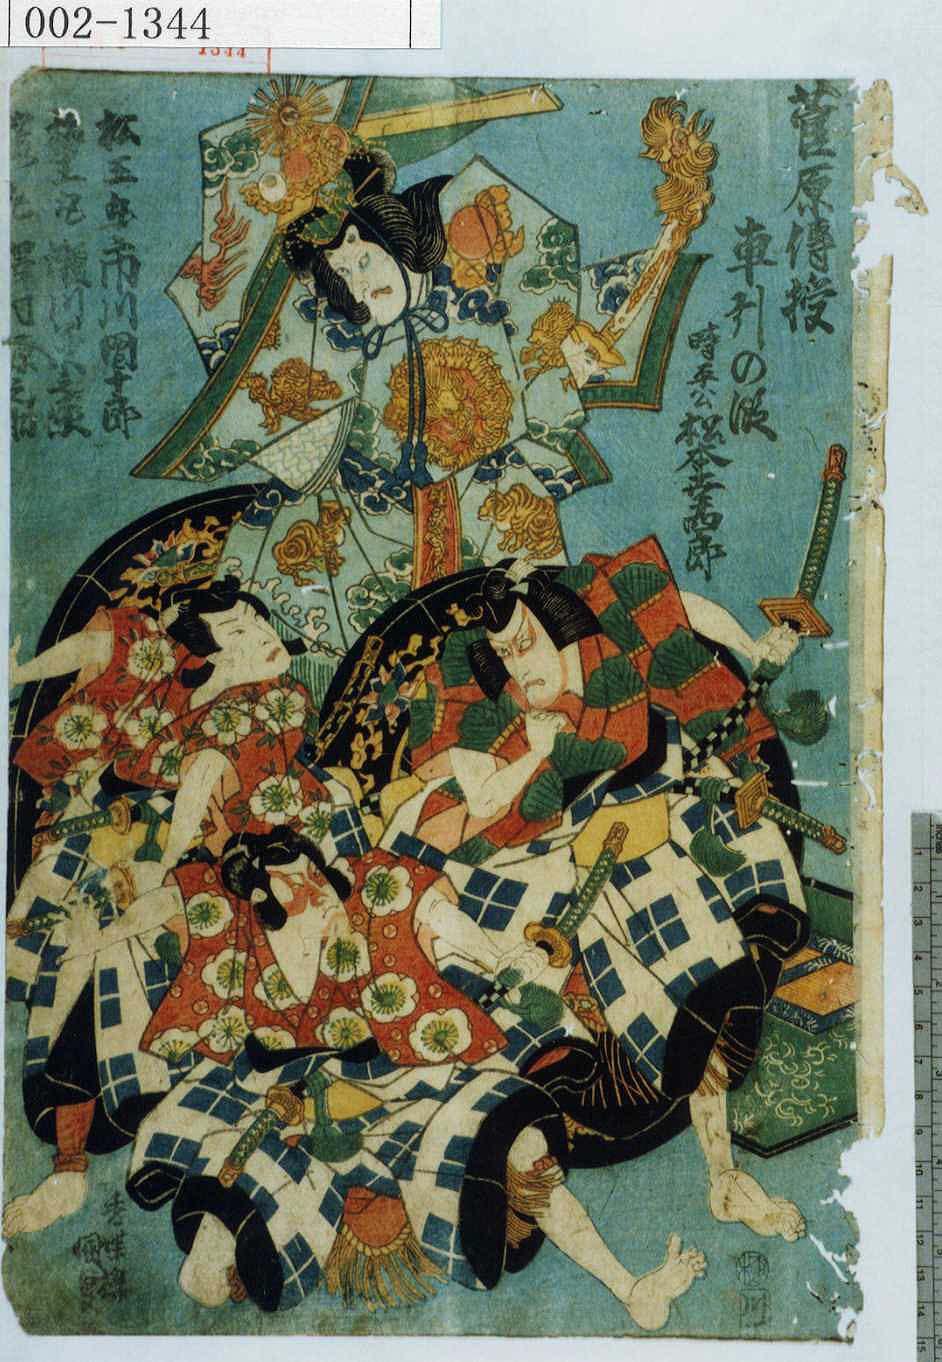 歌川国貞の画像 p1_14